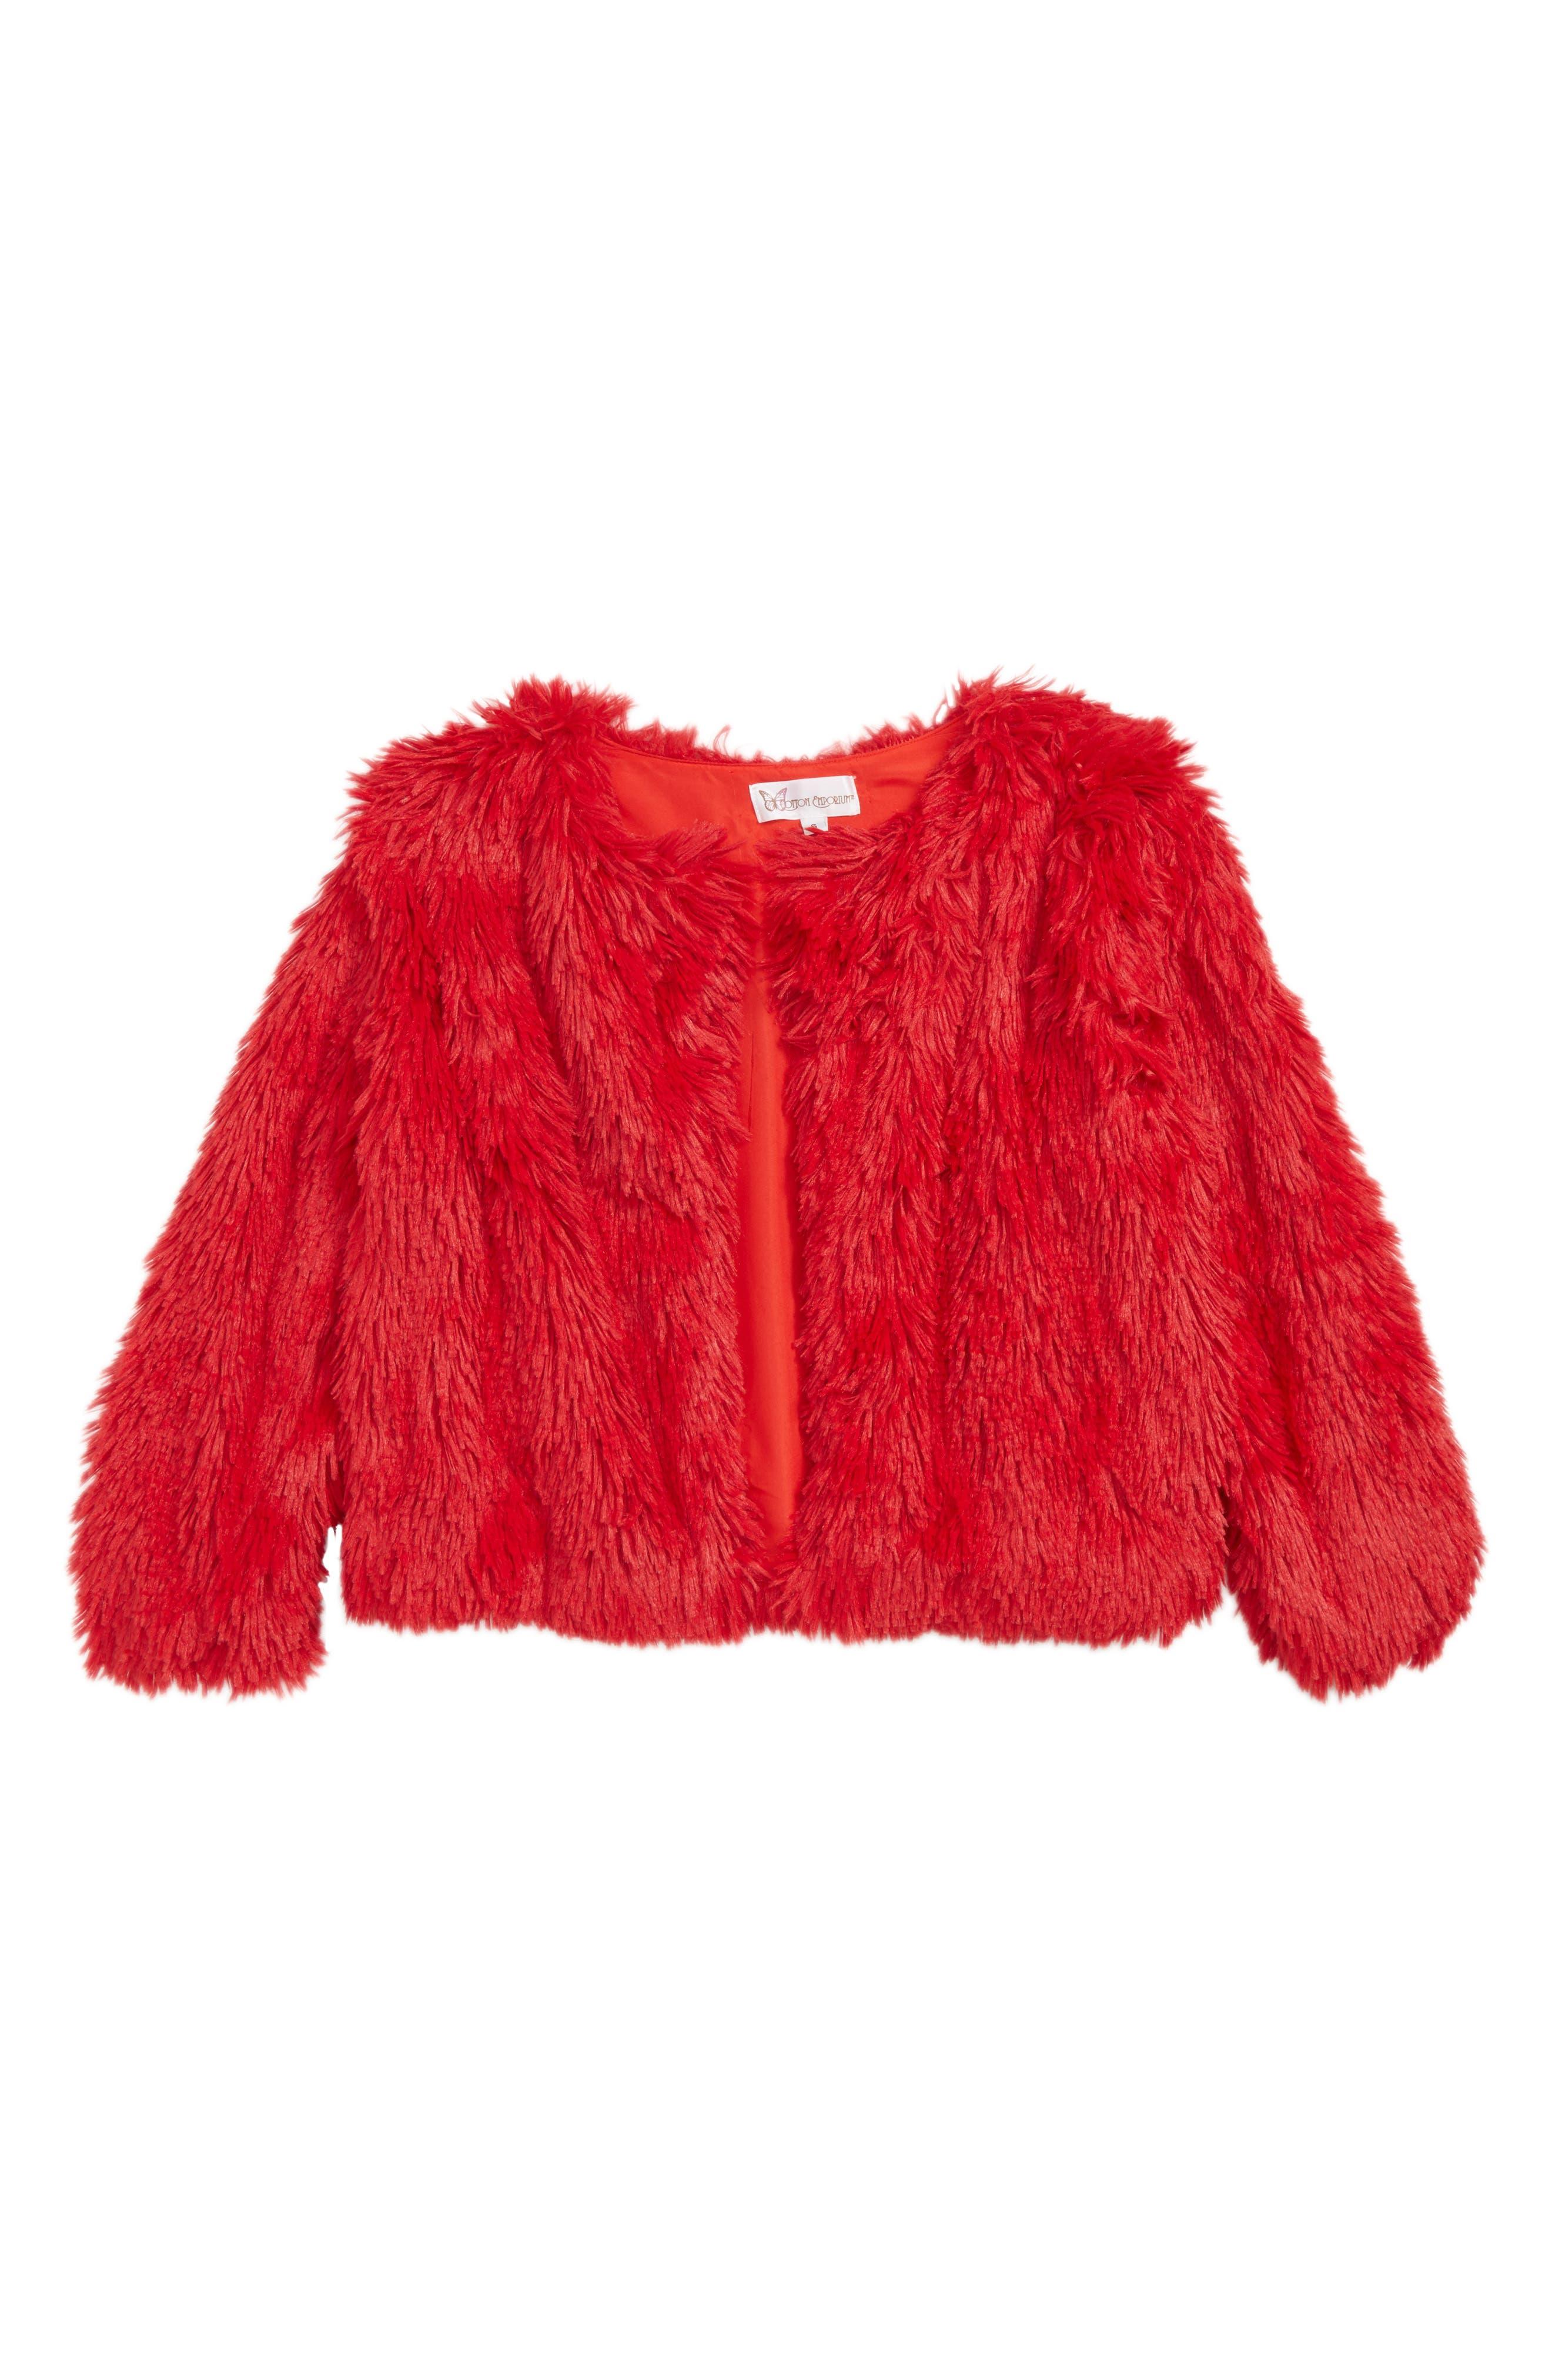 Faux Fur Jacket,                             Main thumbnail 1, color,                             RED